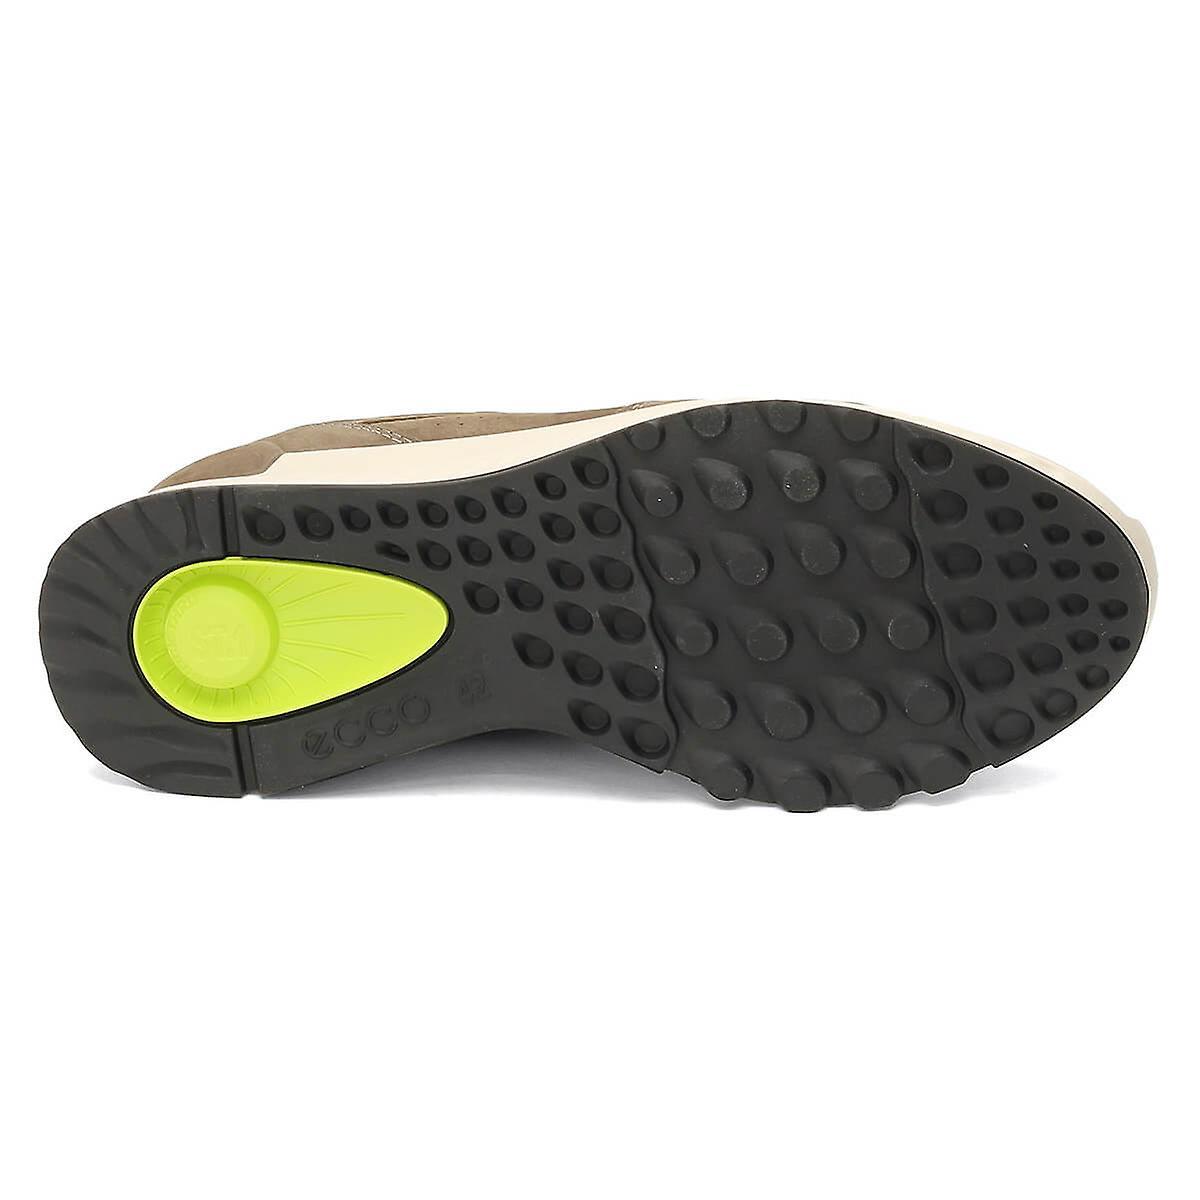 Sneakers comfort estraibili in pelle di Ecco Mens 2020 eAq0lh